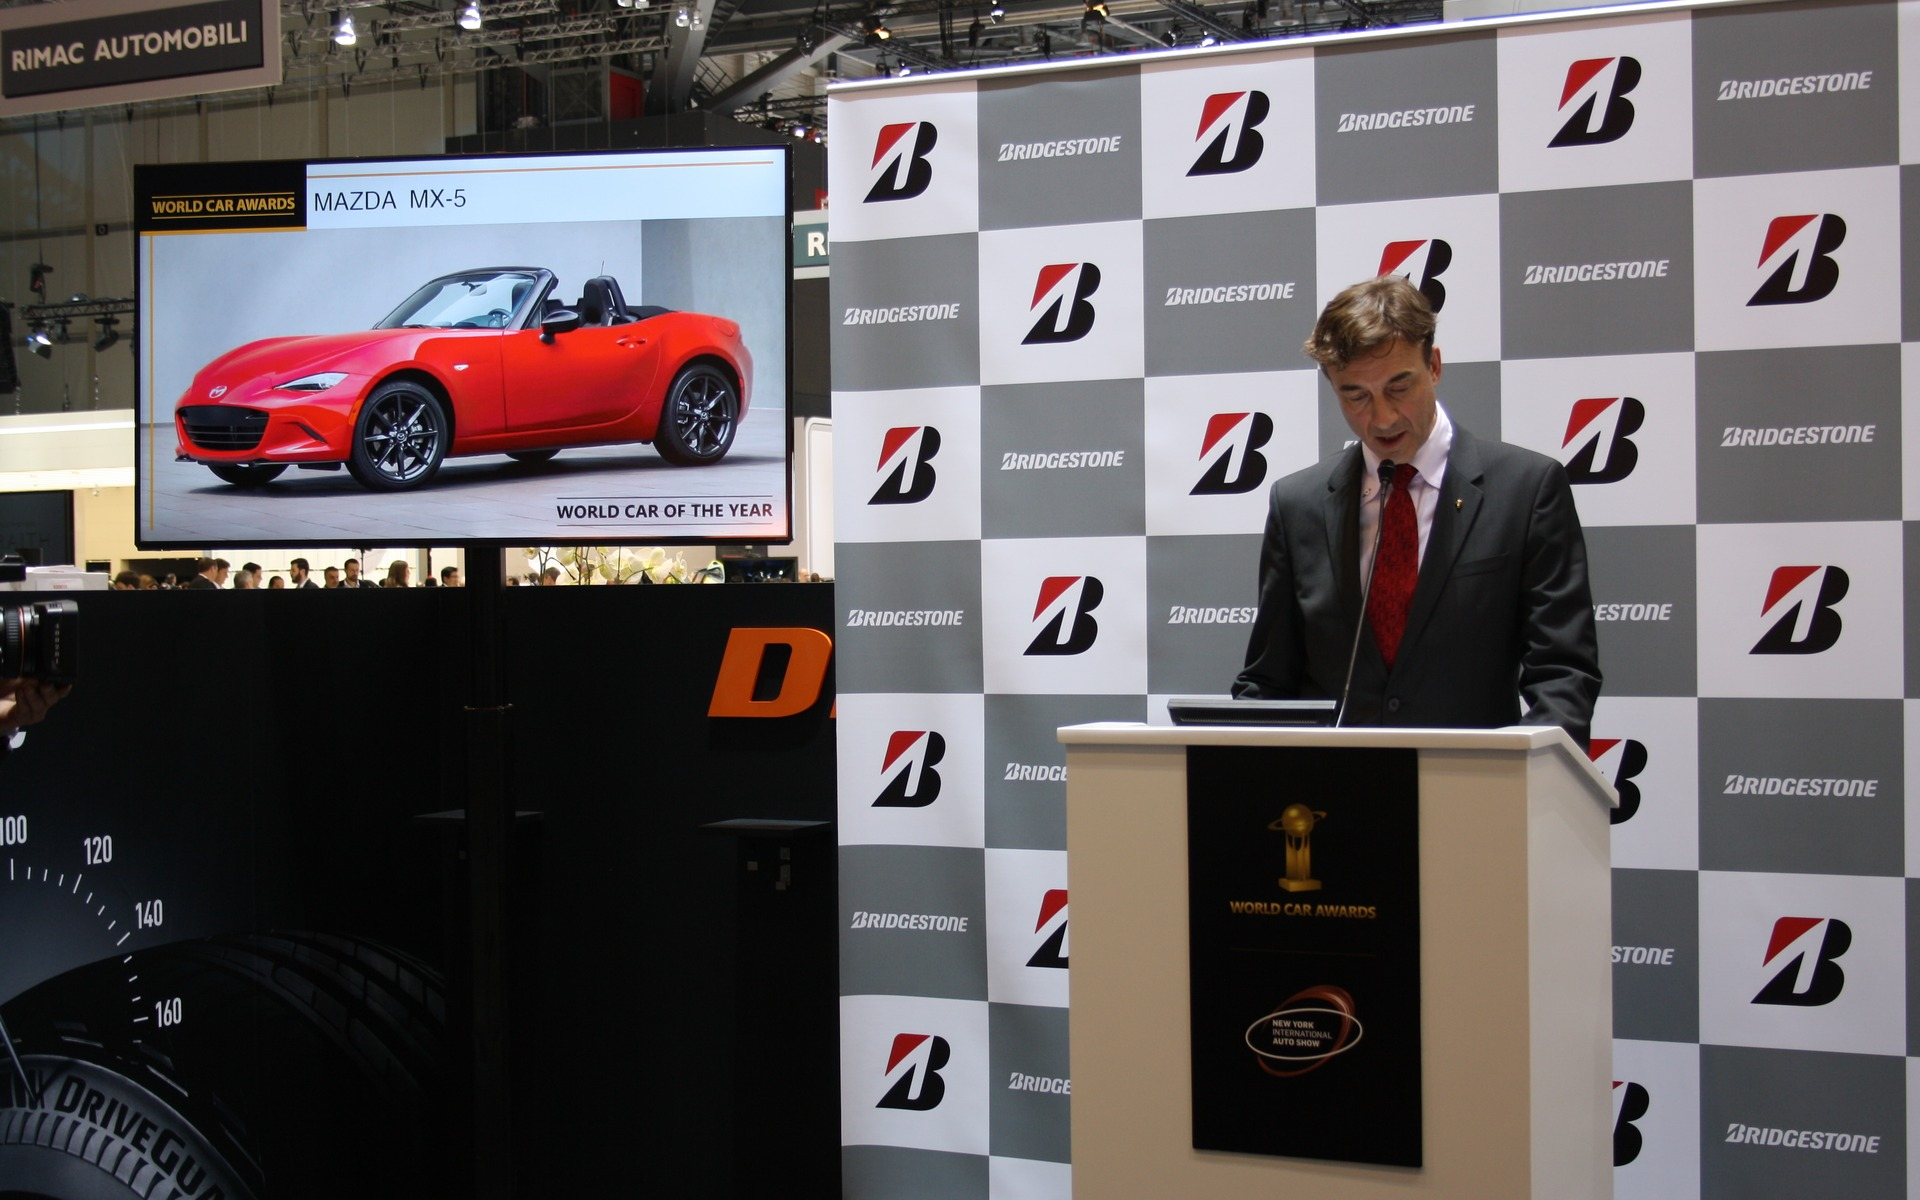 2016 World Car of the Year finalist: Mazda MX-5